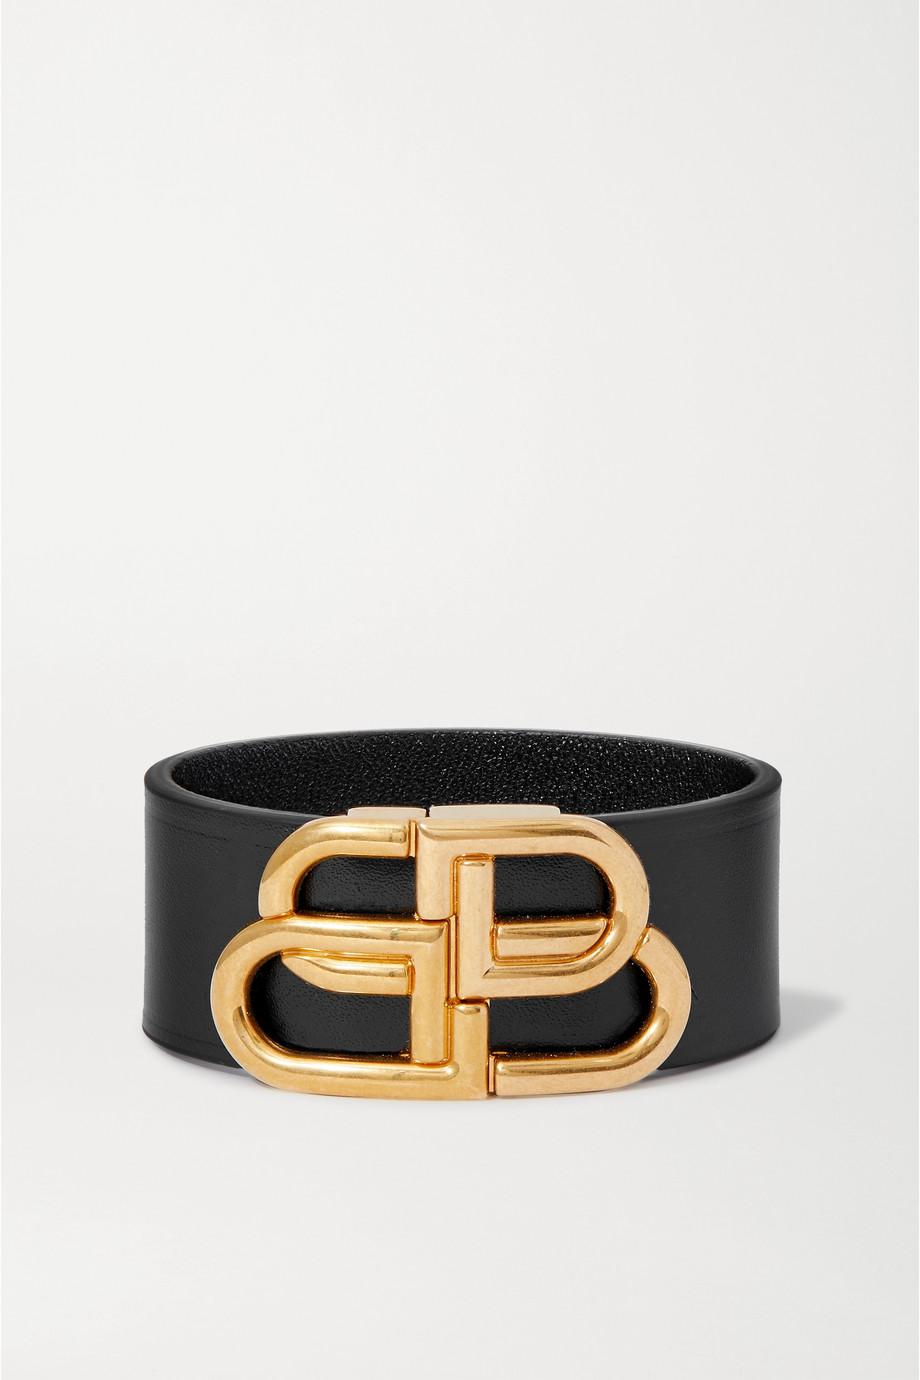 Balenciaga Leather and gold-tone bracelet